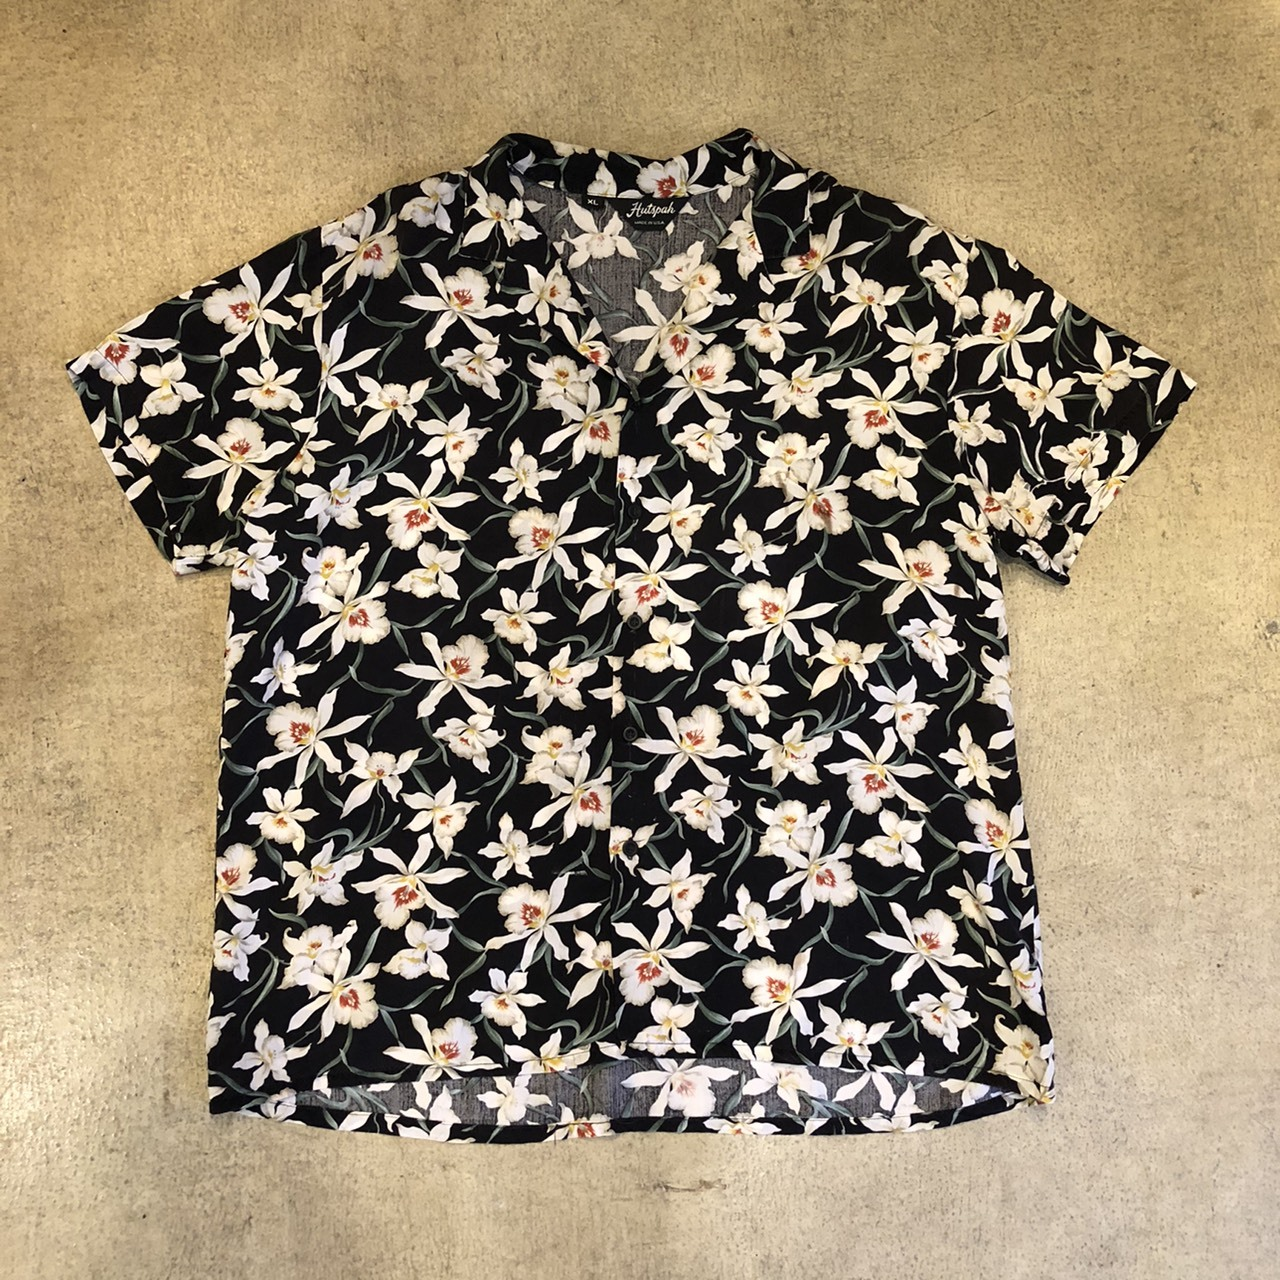 Hutspah Aloha Shirts ¥5,400+tax